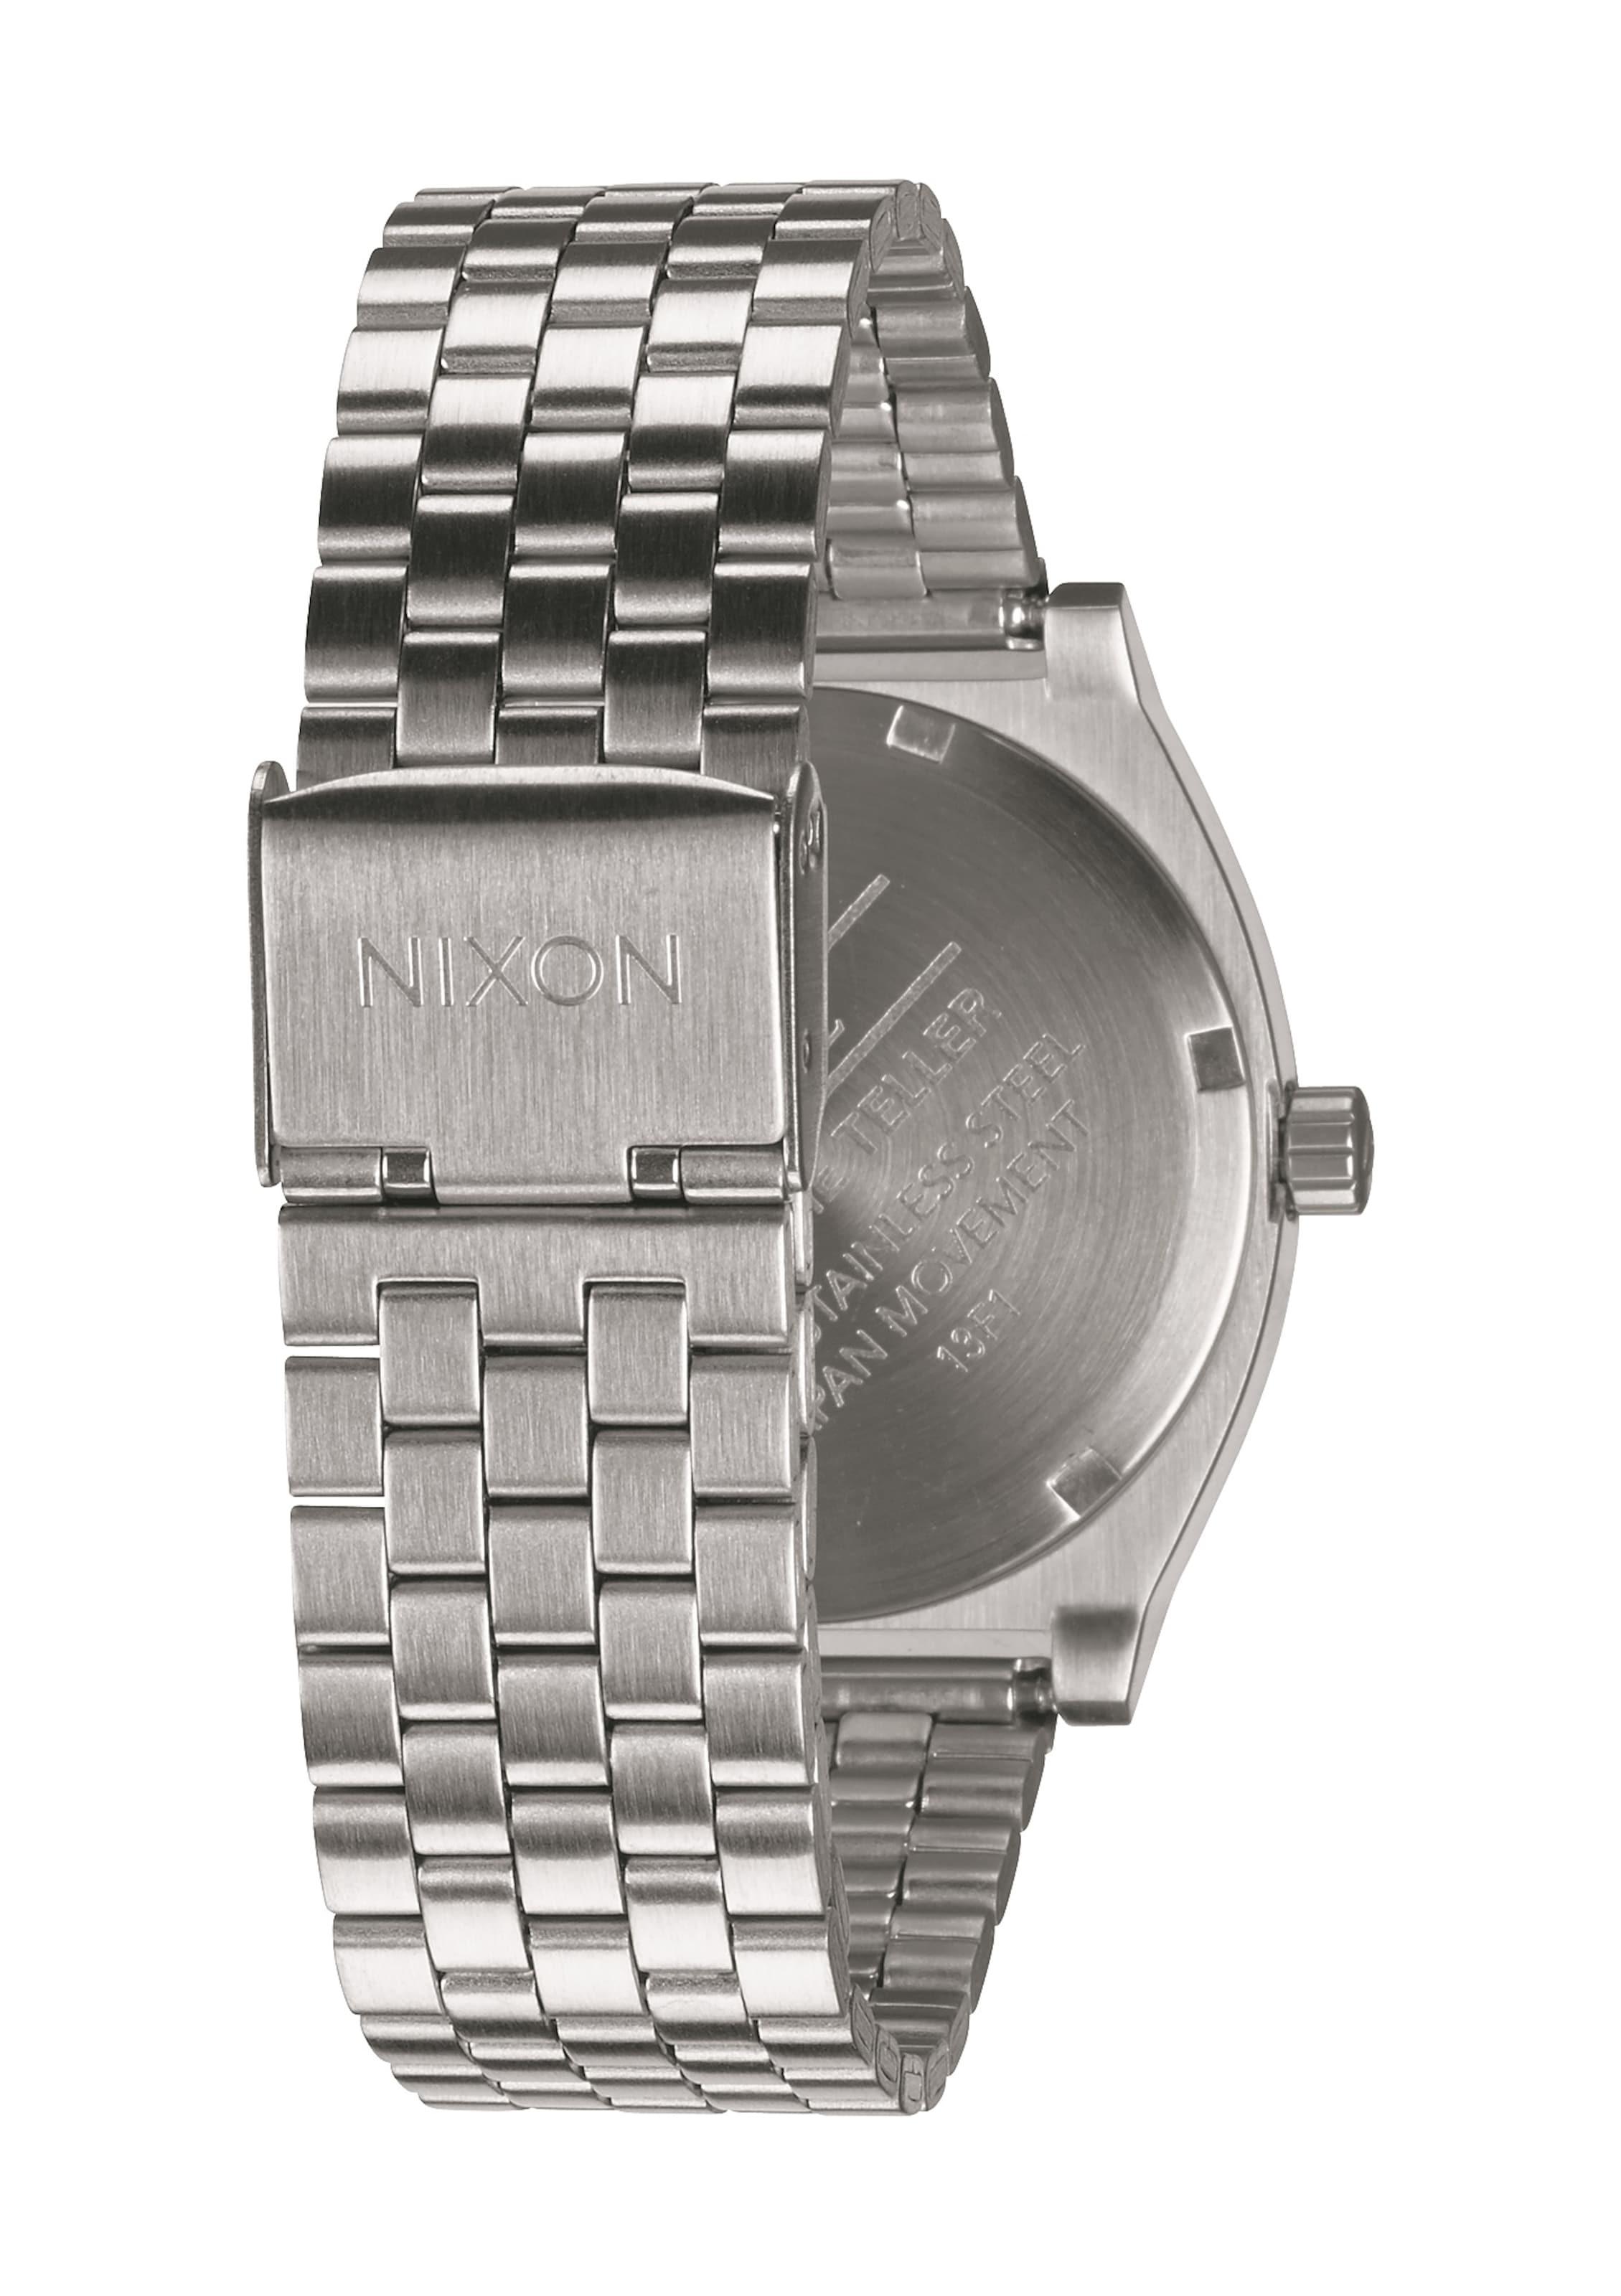 SchwarzSilber Armbanduhr Nixon 'time Teller' In rodCxBeQWE